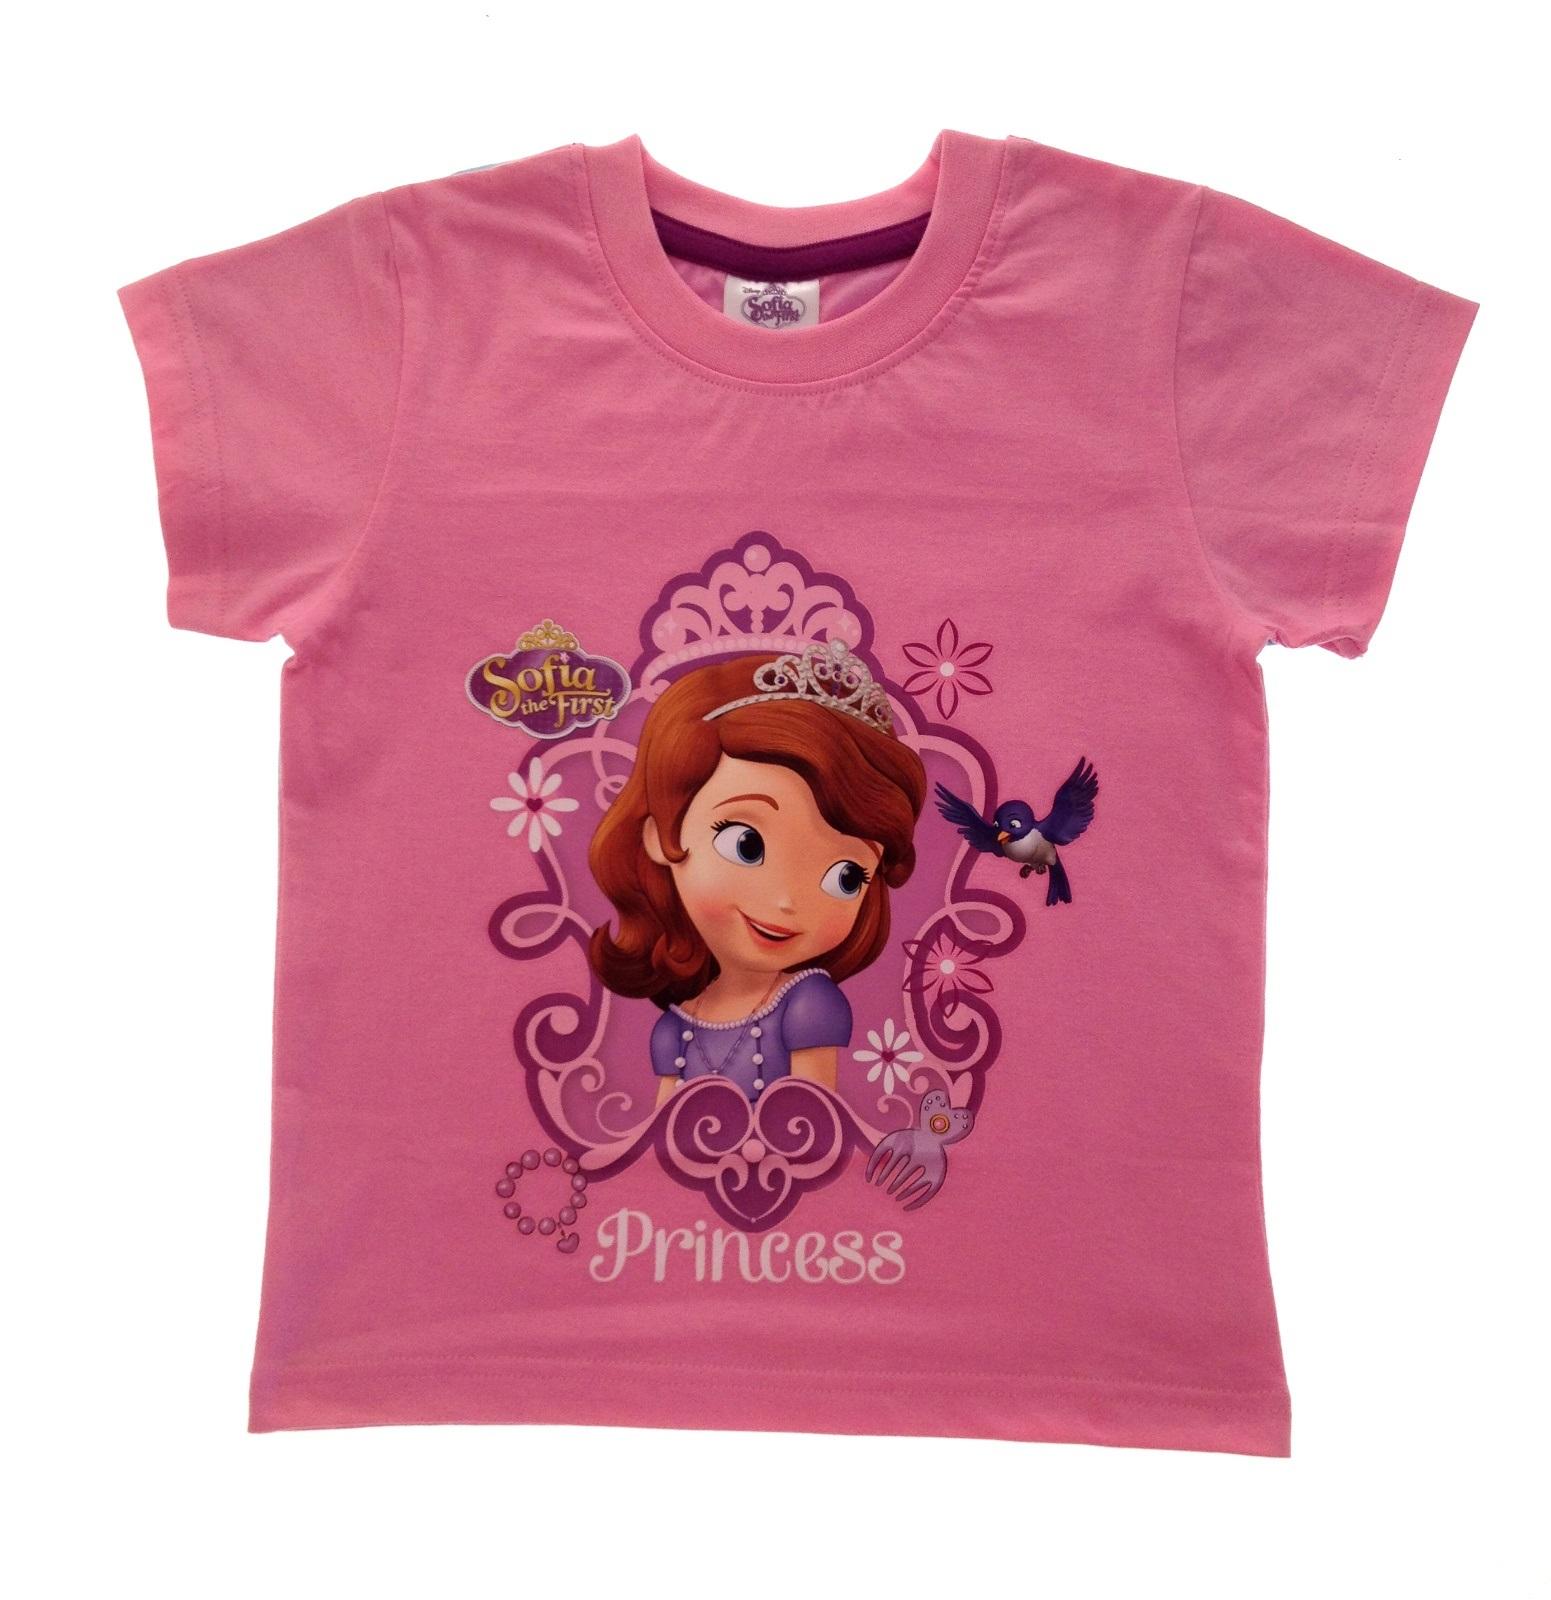 girls disney princess sofia the first summer tops t shirts size uk 2 8 years ebay. Black Bedroom Furniture Sets. Home Design Ideas